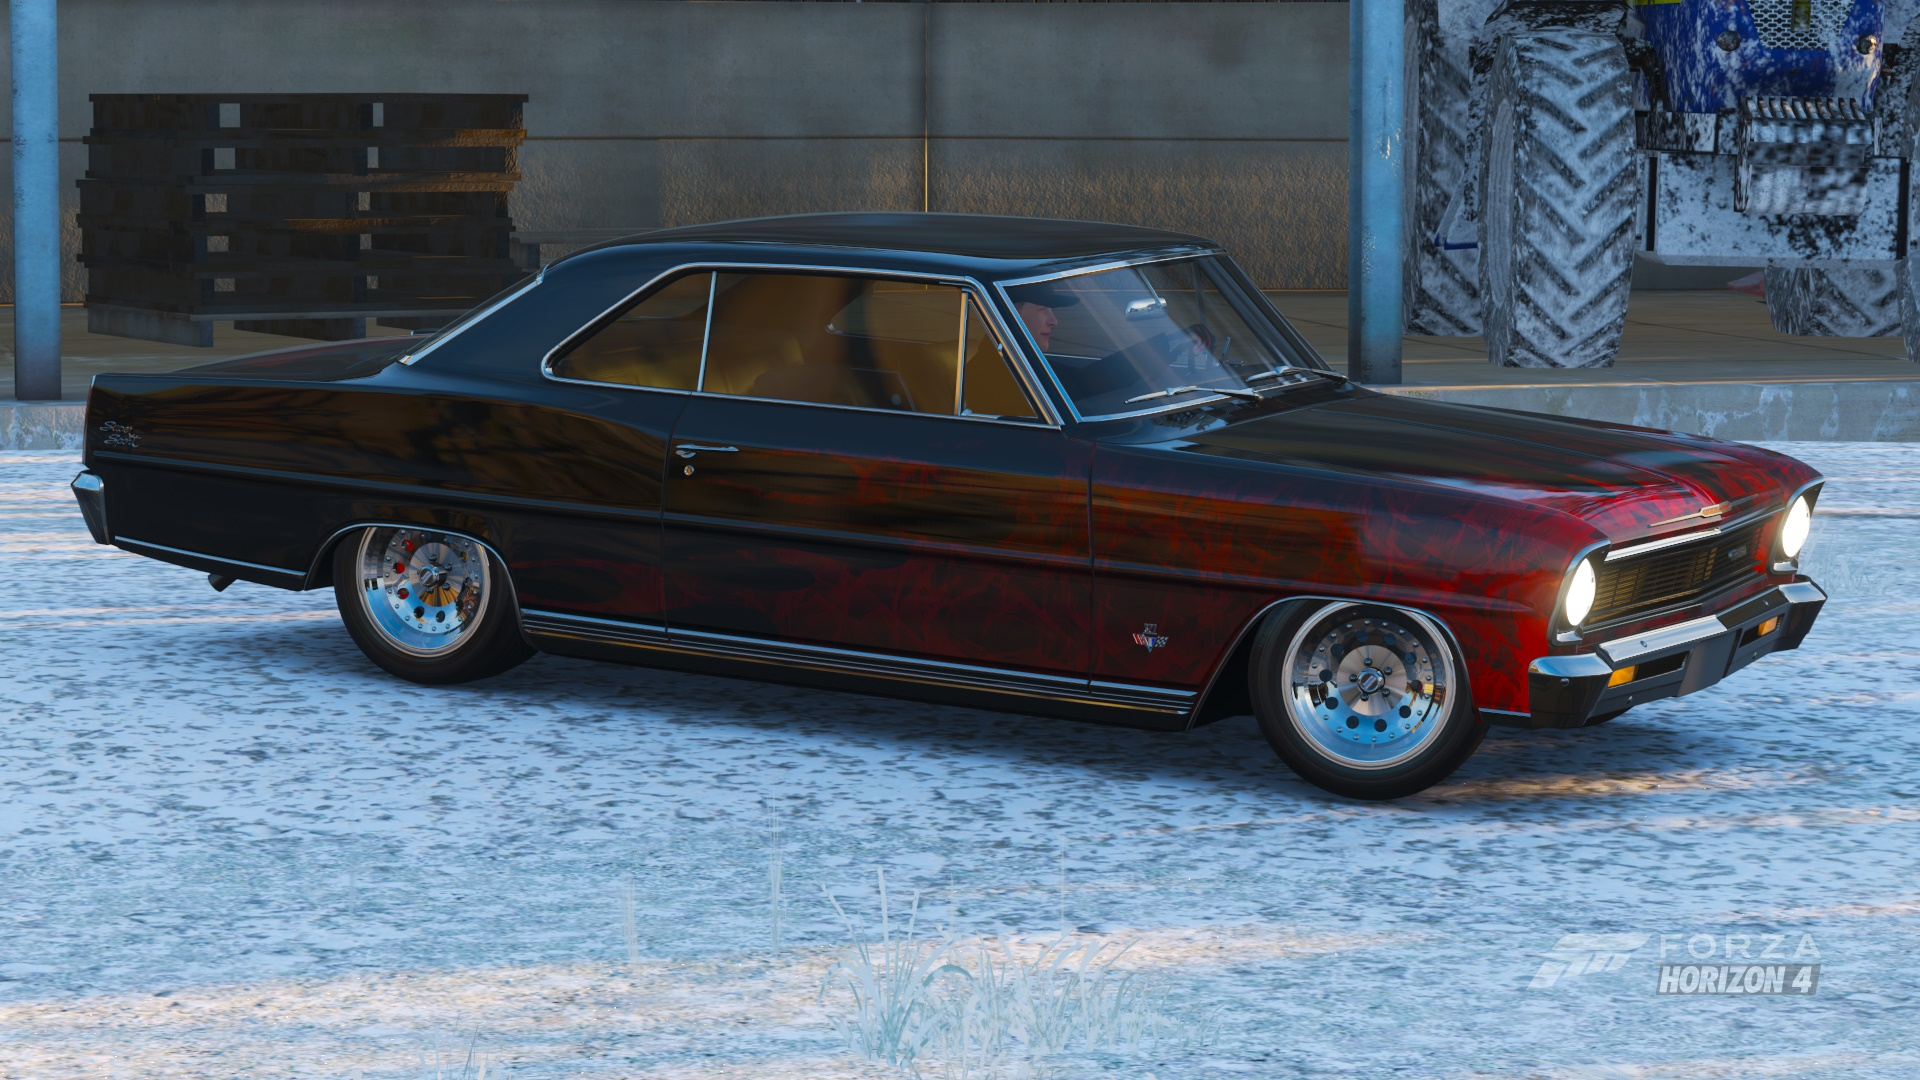 Btm Bigtime Muscle Paints Tunes New And News 1966 Chevy Impala Forum Car 1964 Chevrolet Super Sport 409 Paint 64